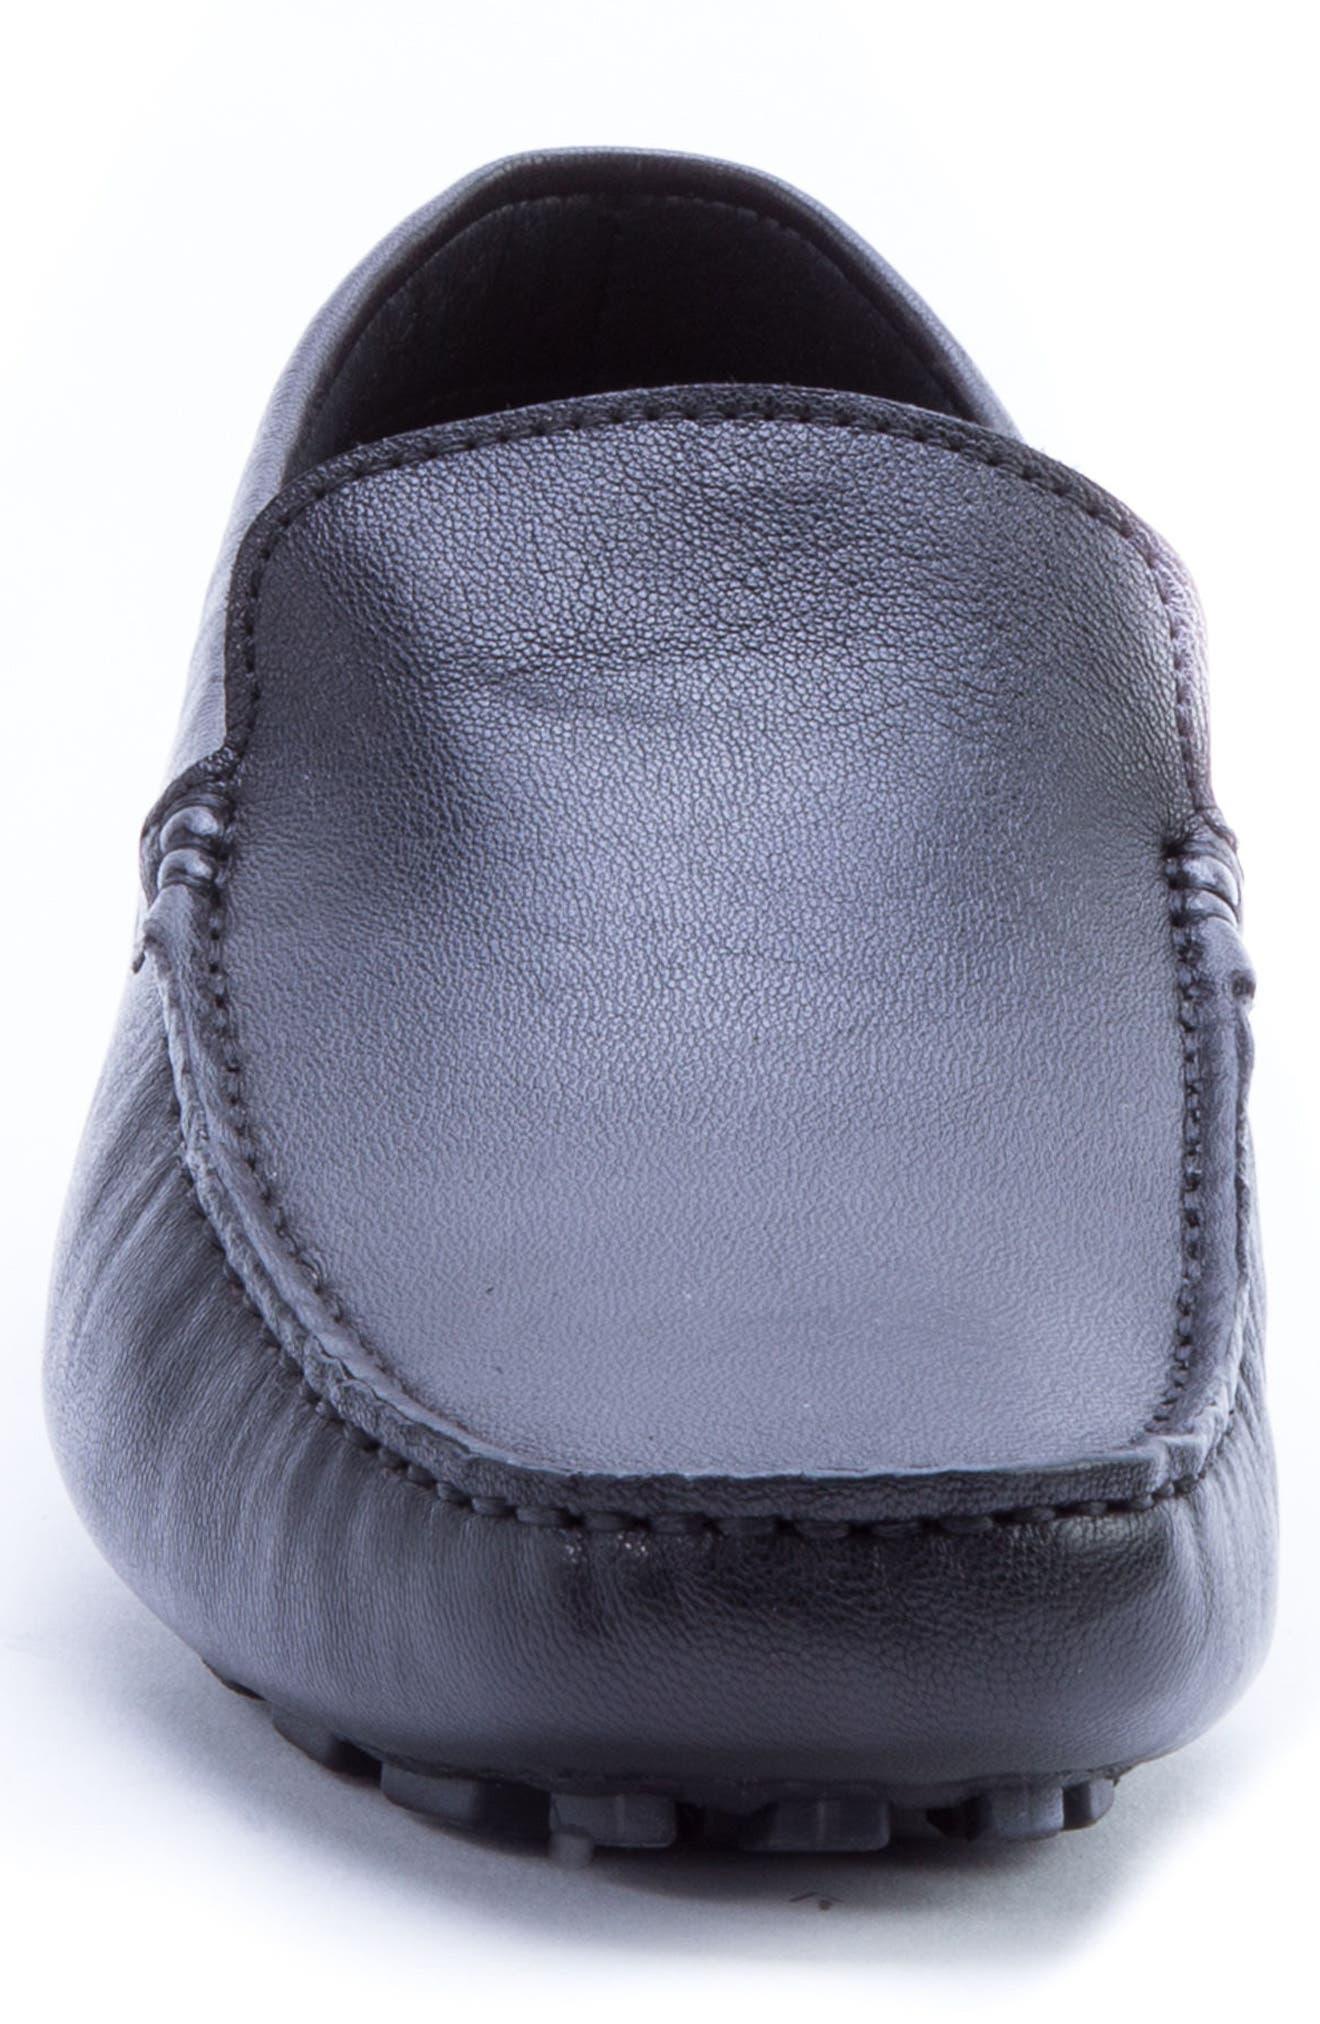 ZANZARA,                             Picasso 3 Moc Toe Driving Loafer,                             Alternate thumbnail 4, color,                             BLACK LEATHER